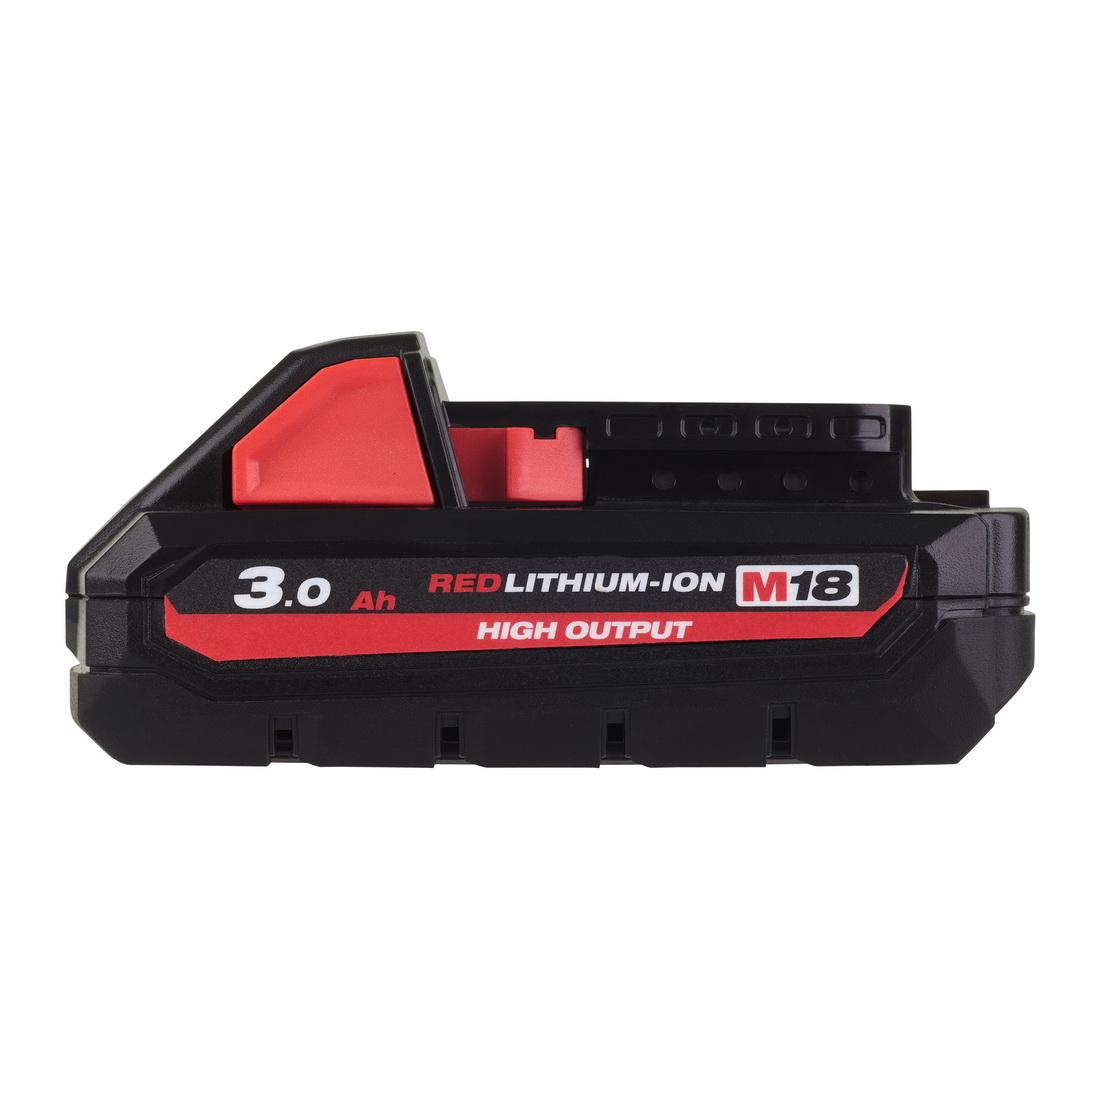 M18 REDLITHIUM High Output Battery 3.0Ah